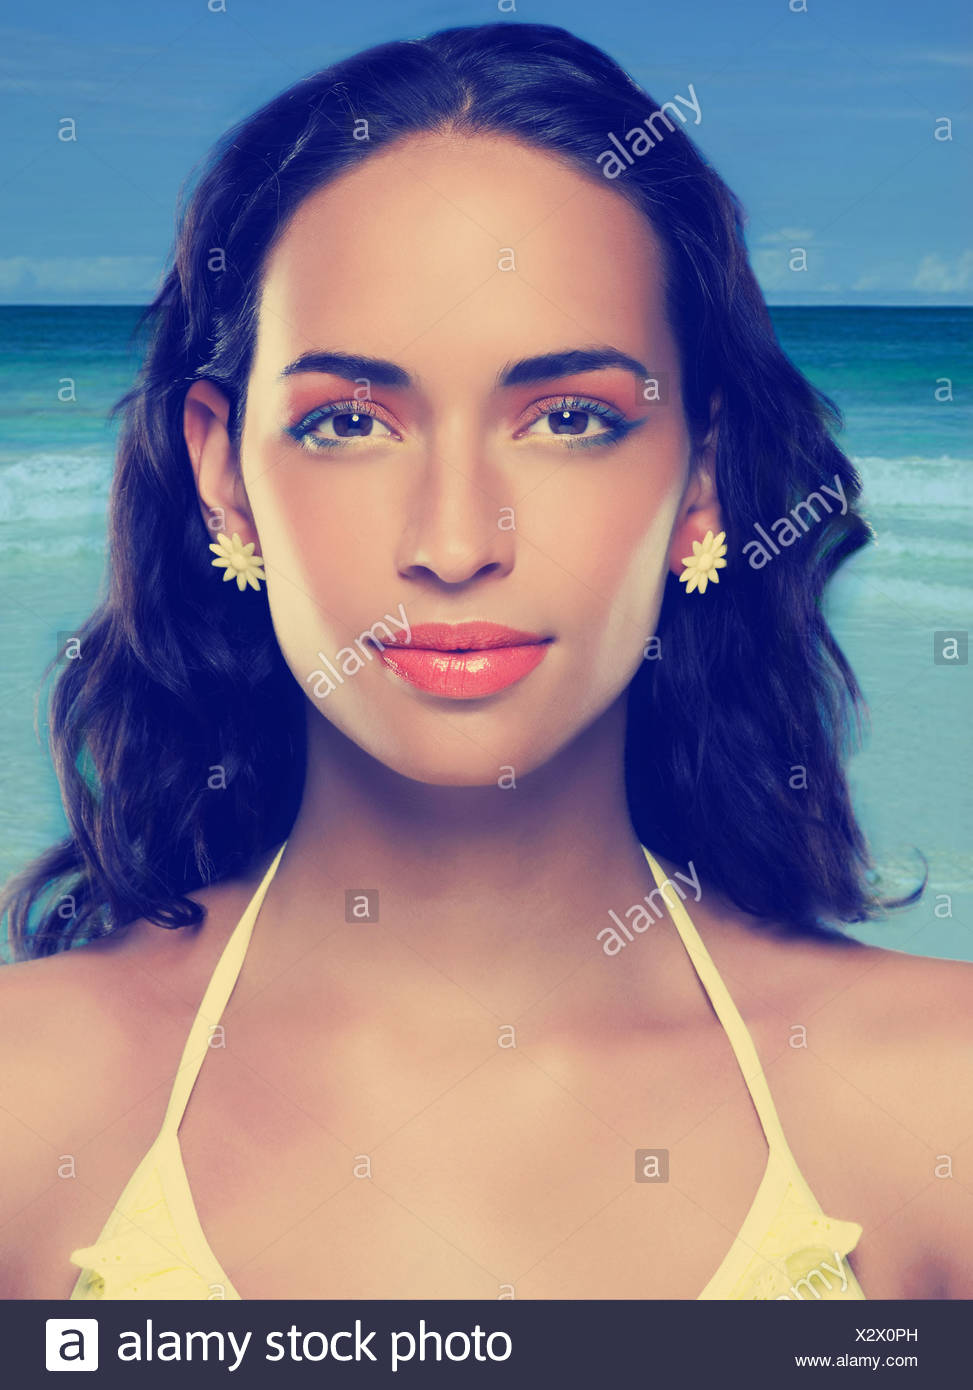 Young woman wearing yellow bikini and earrings Stock Photo